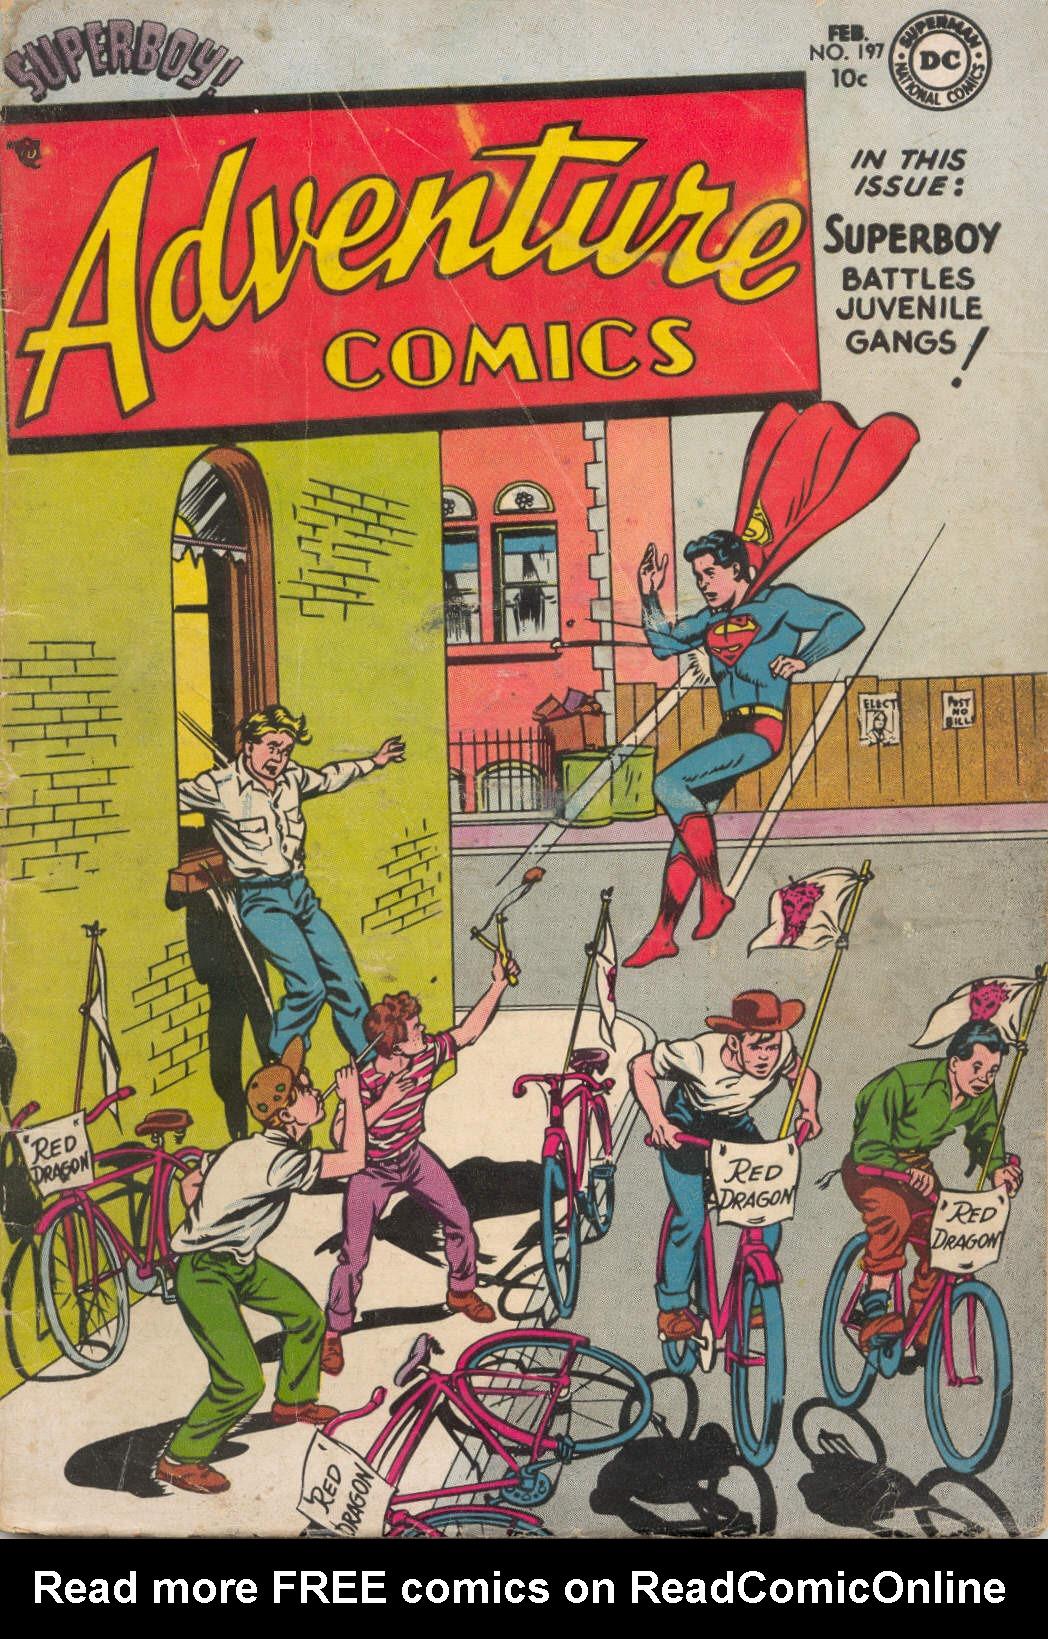 Read online Adventure Comics (1938) comic -  Issue #197 - 1